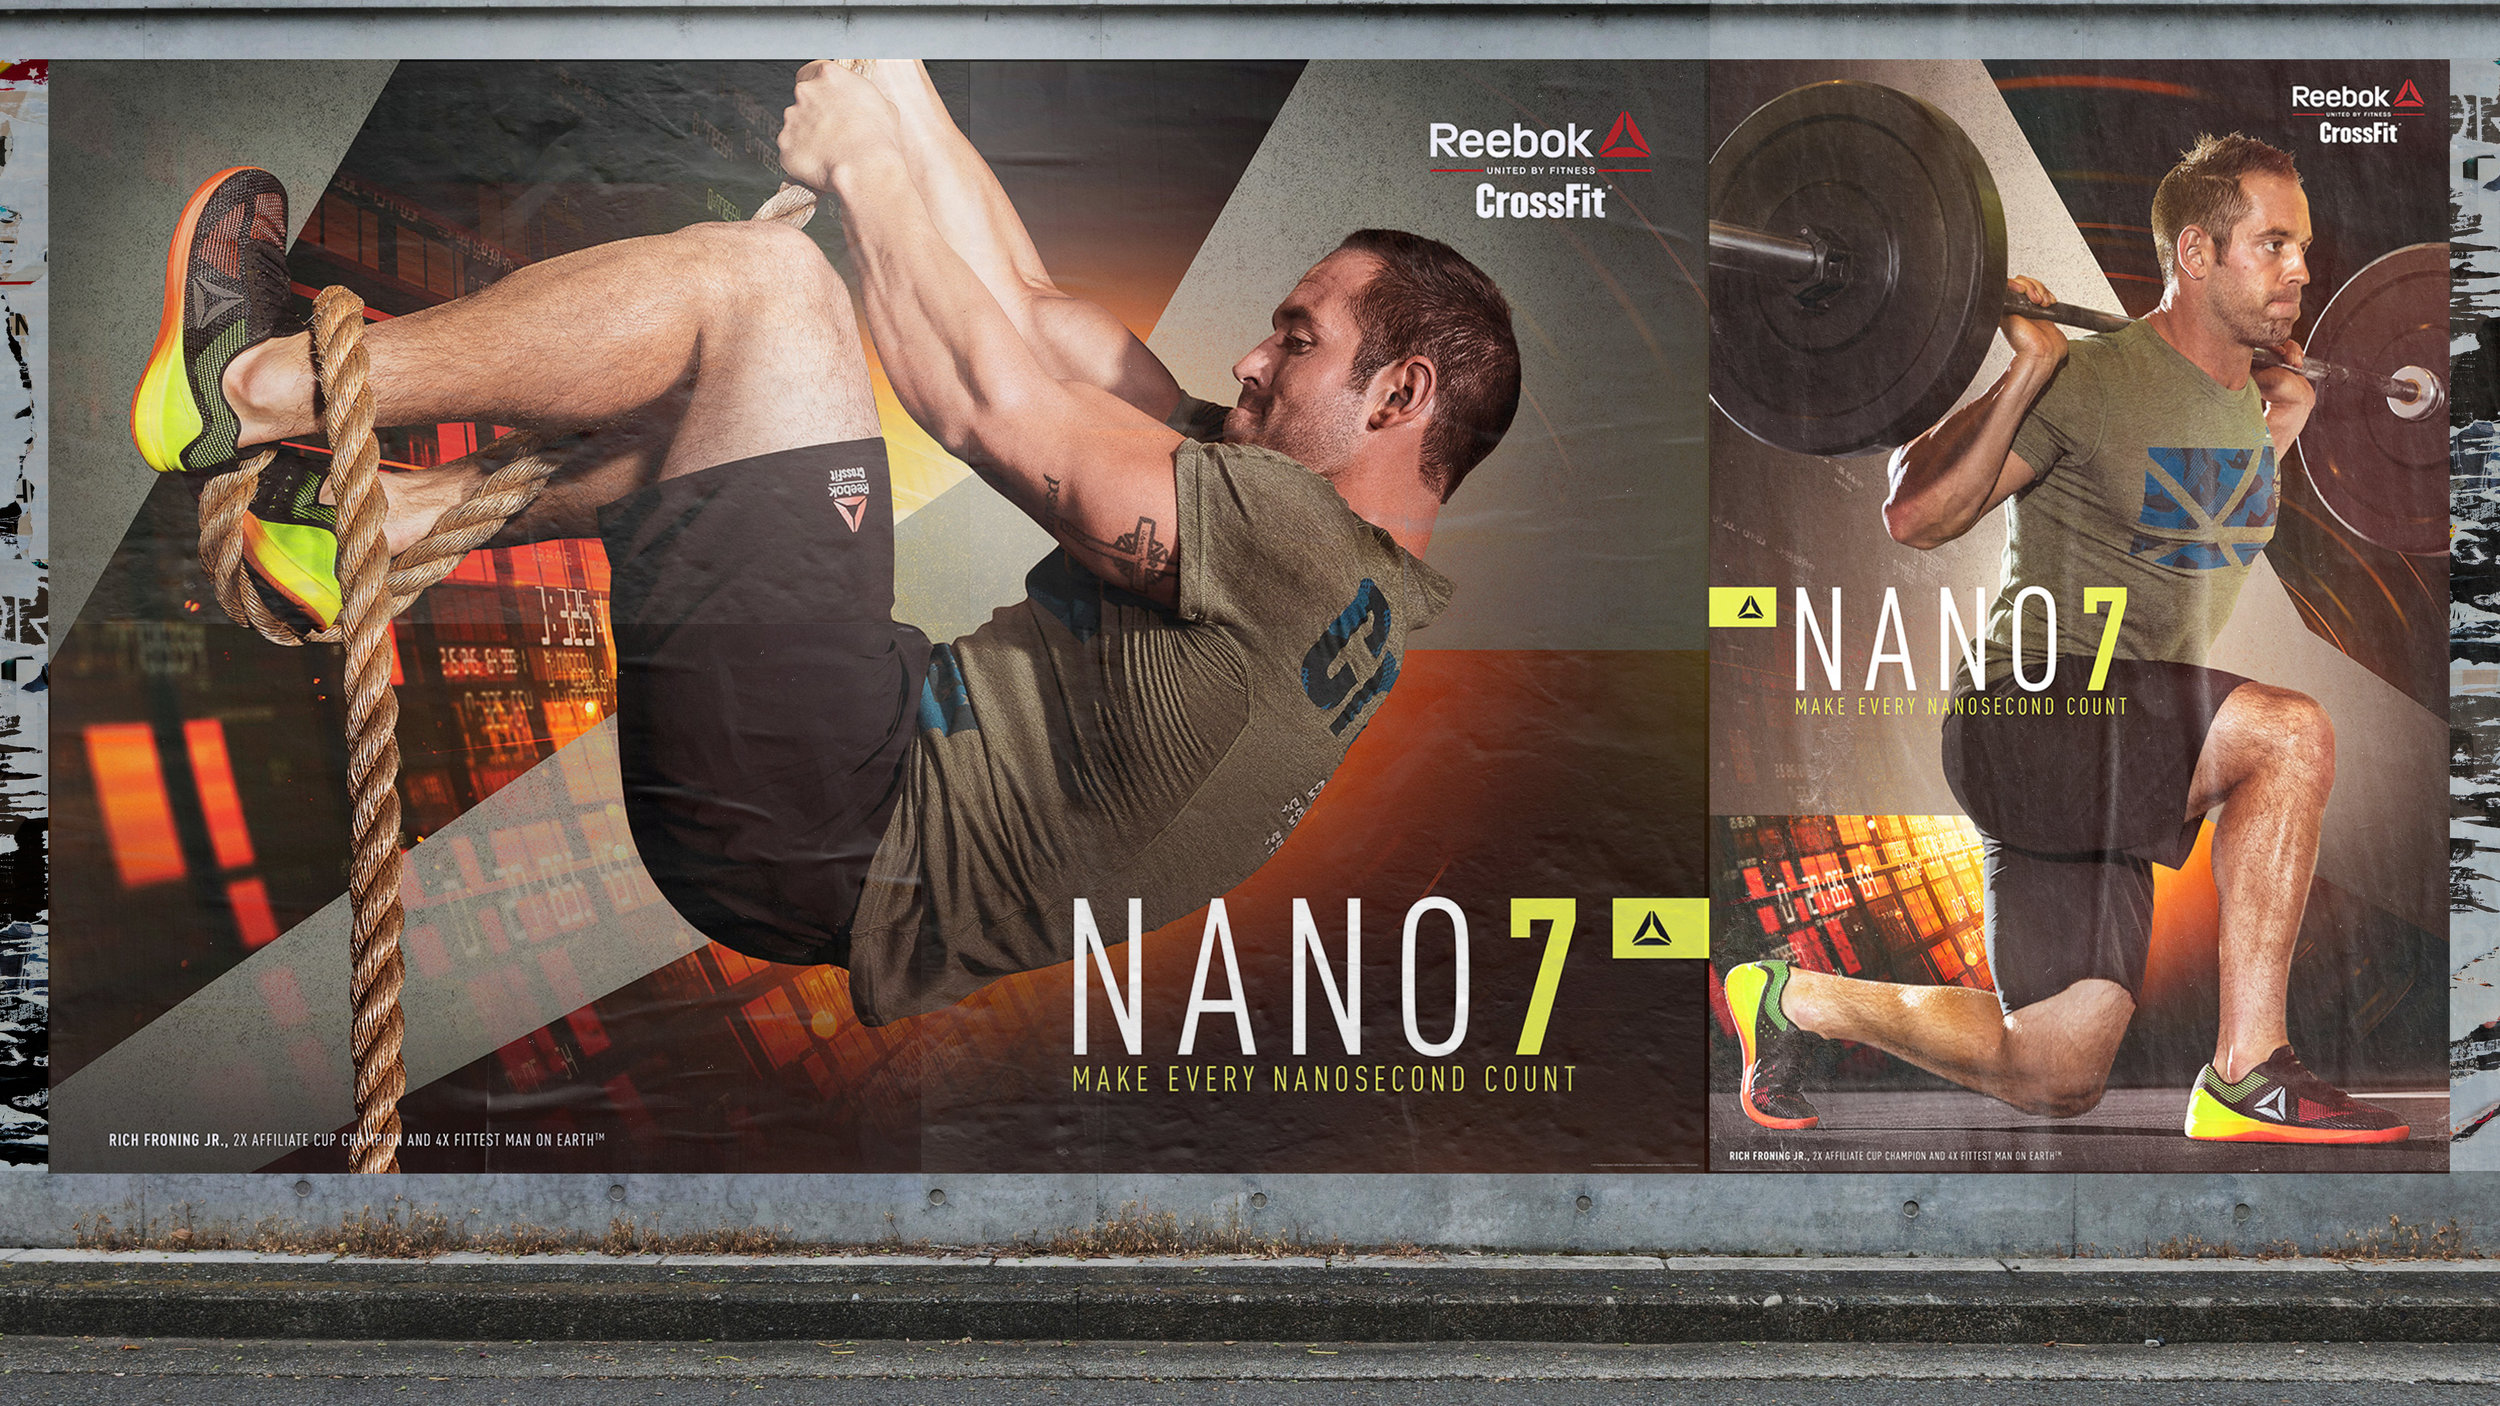 Nano_7_male)poster_mock.jpg